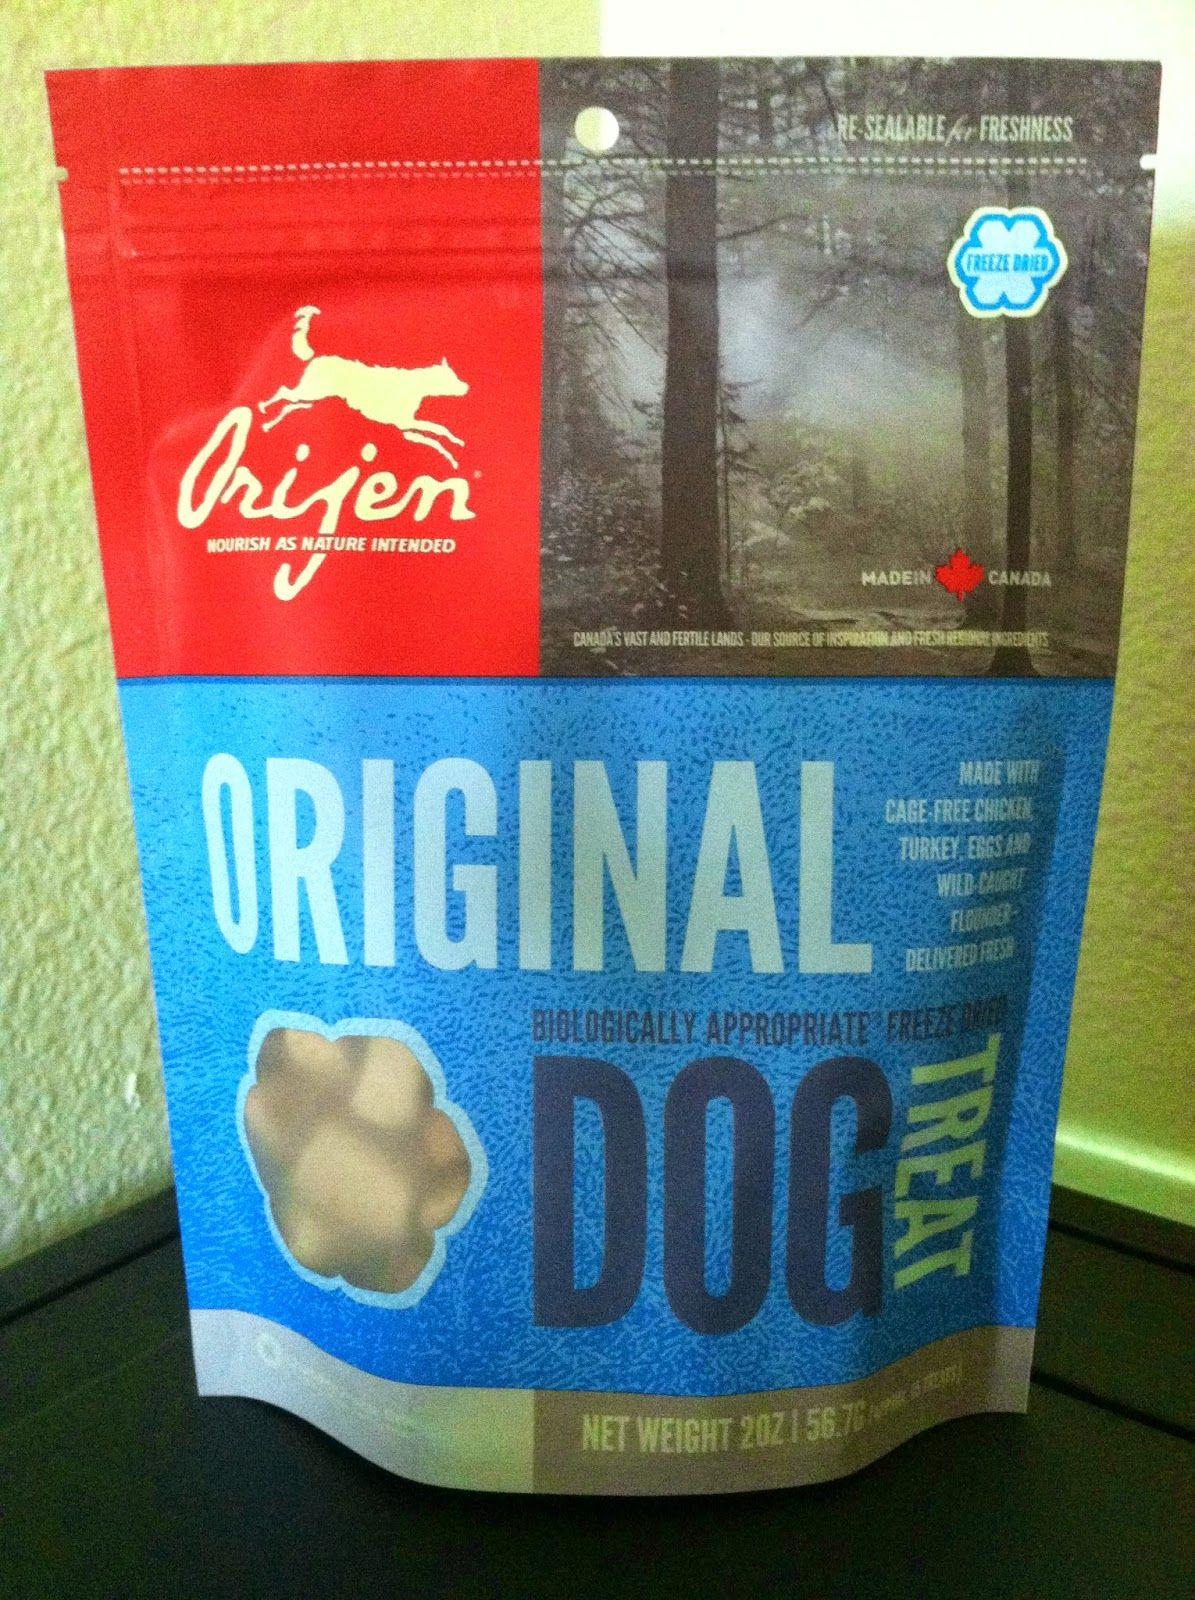 Orijen Pet Foods Freeze Dried Dog Treats Review from